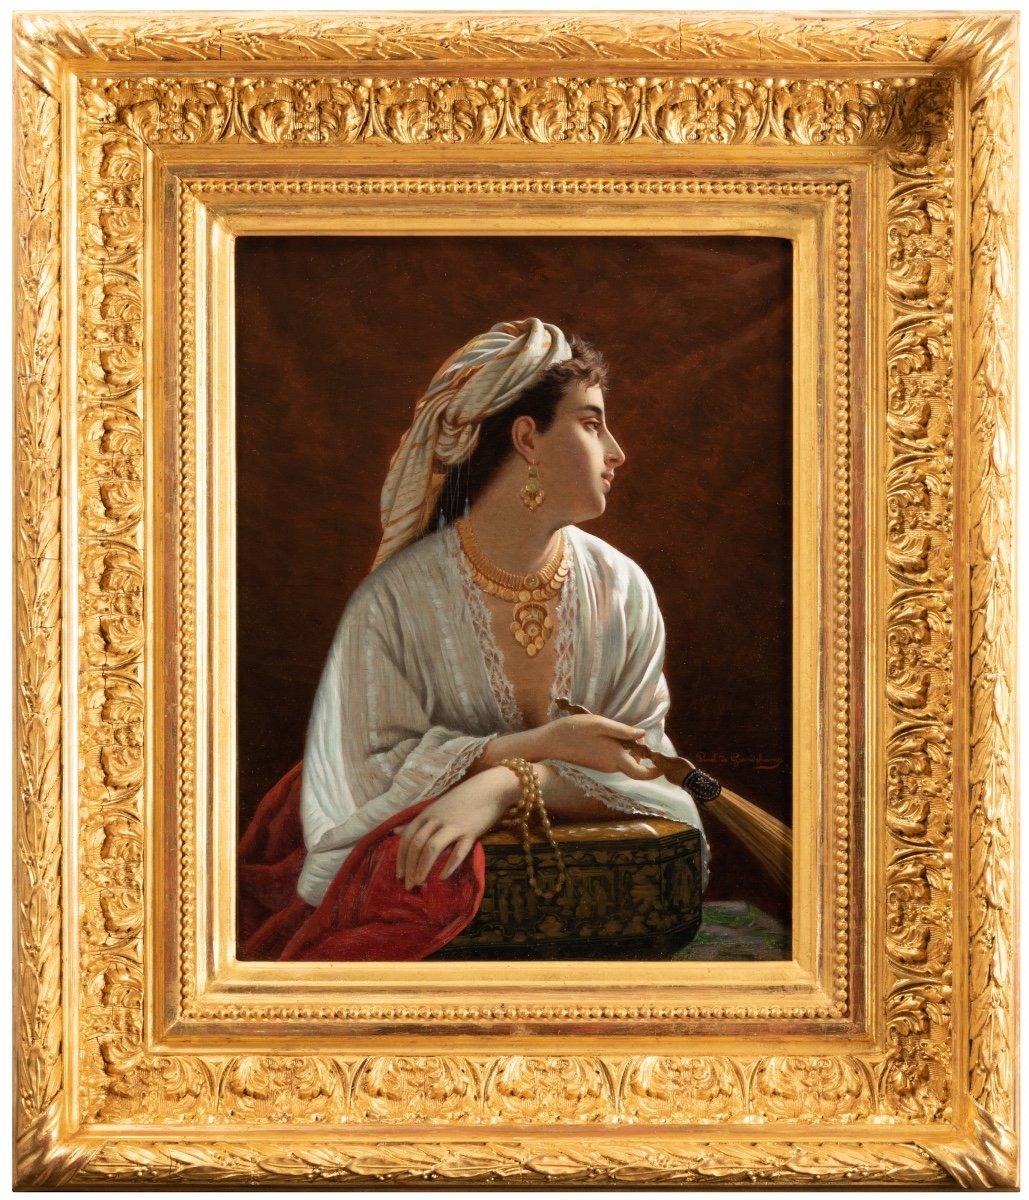 Louis Emile Pinel De Grandchamp (1820-1894) La Belle Orientale